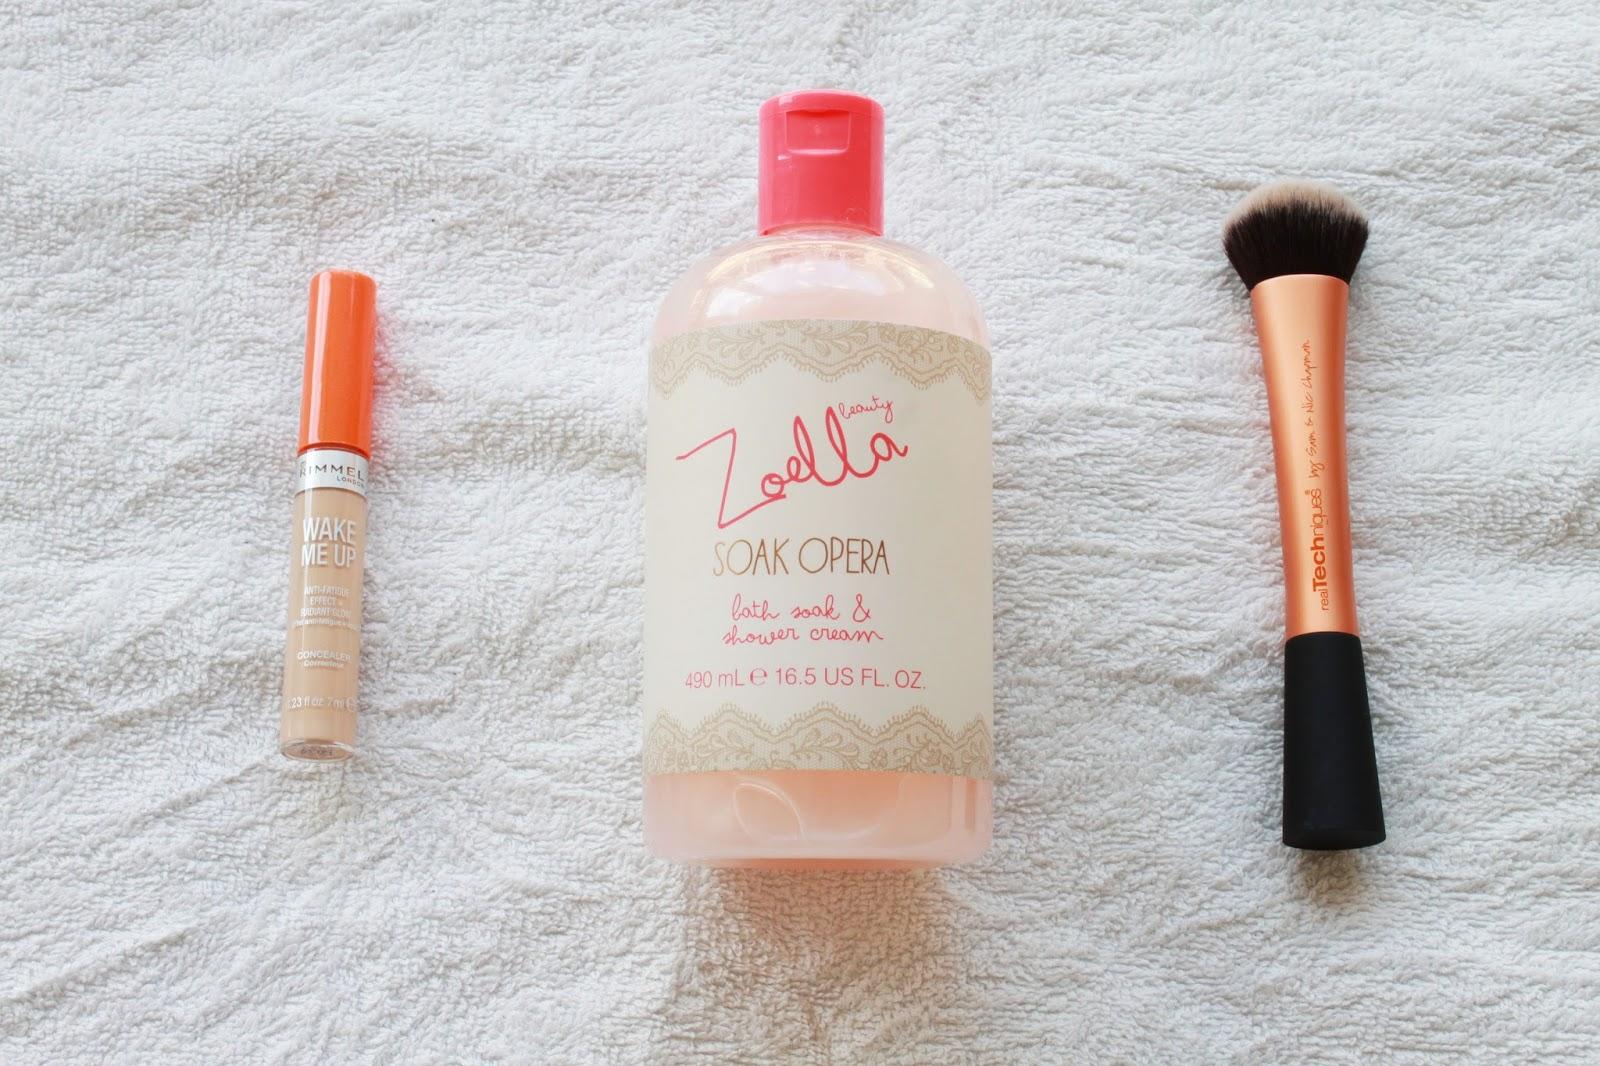 2015 Beauty Favourites: Rimmel Wake Me Up Concealer, Zoella Beauty Soak Opera Bath Soak & Shower Cream, Real Techniques Expert Face Brush